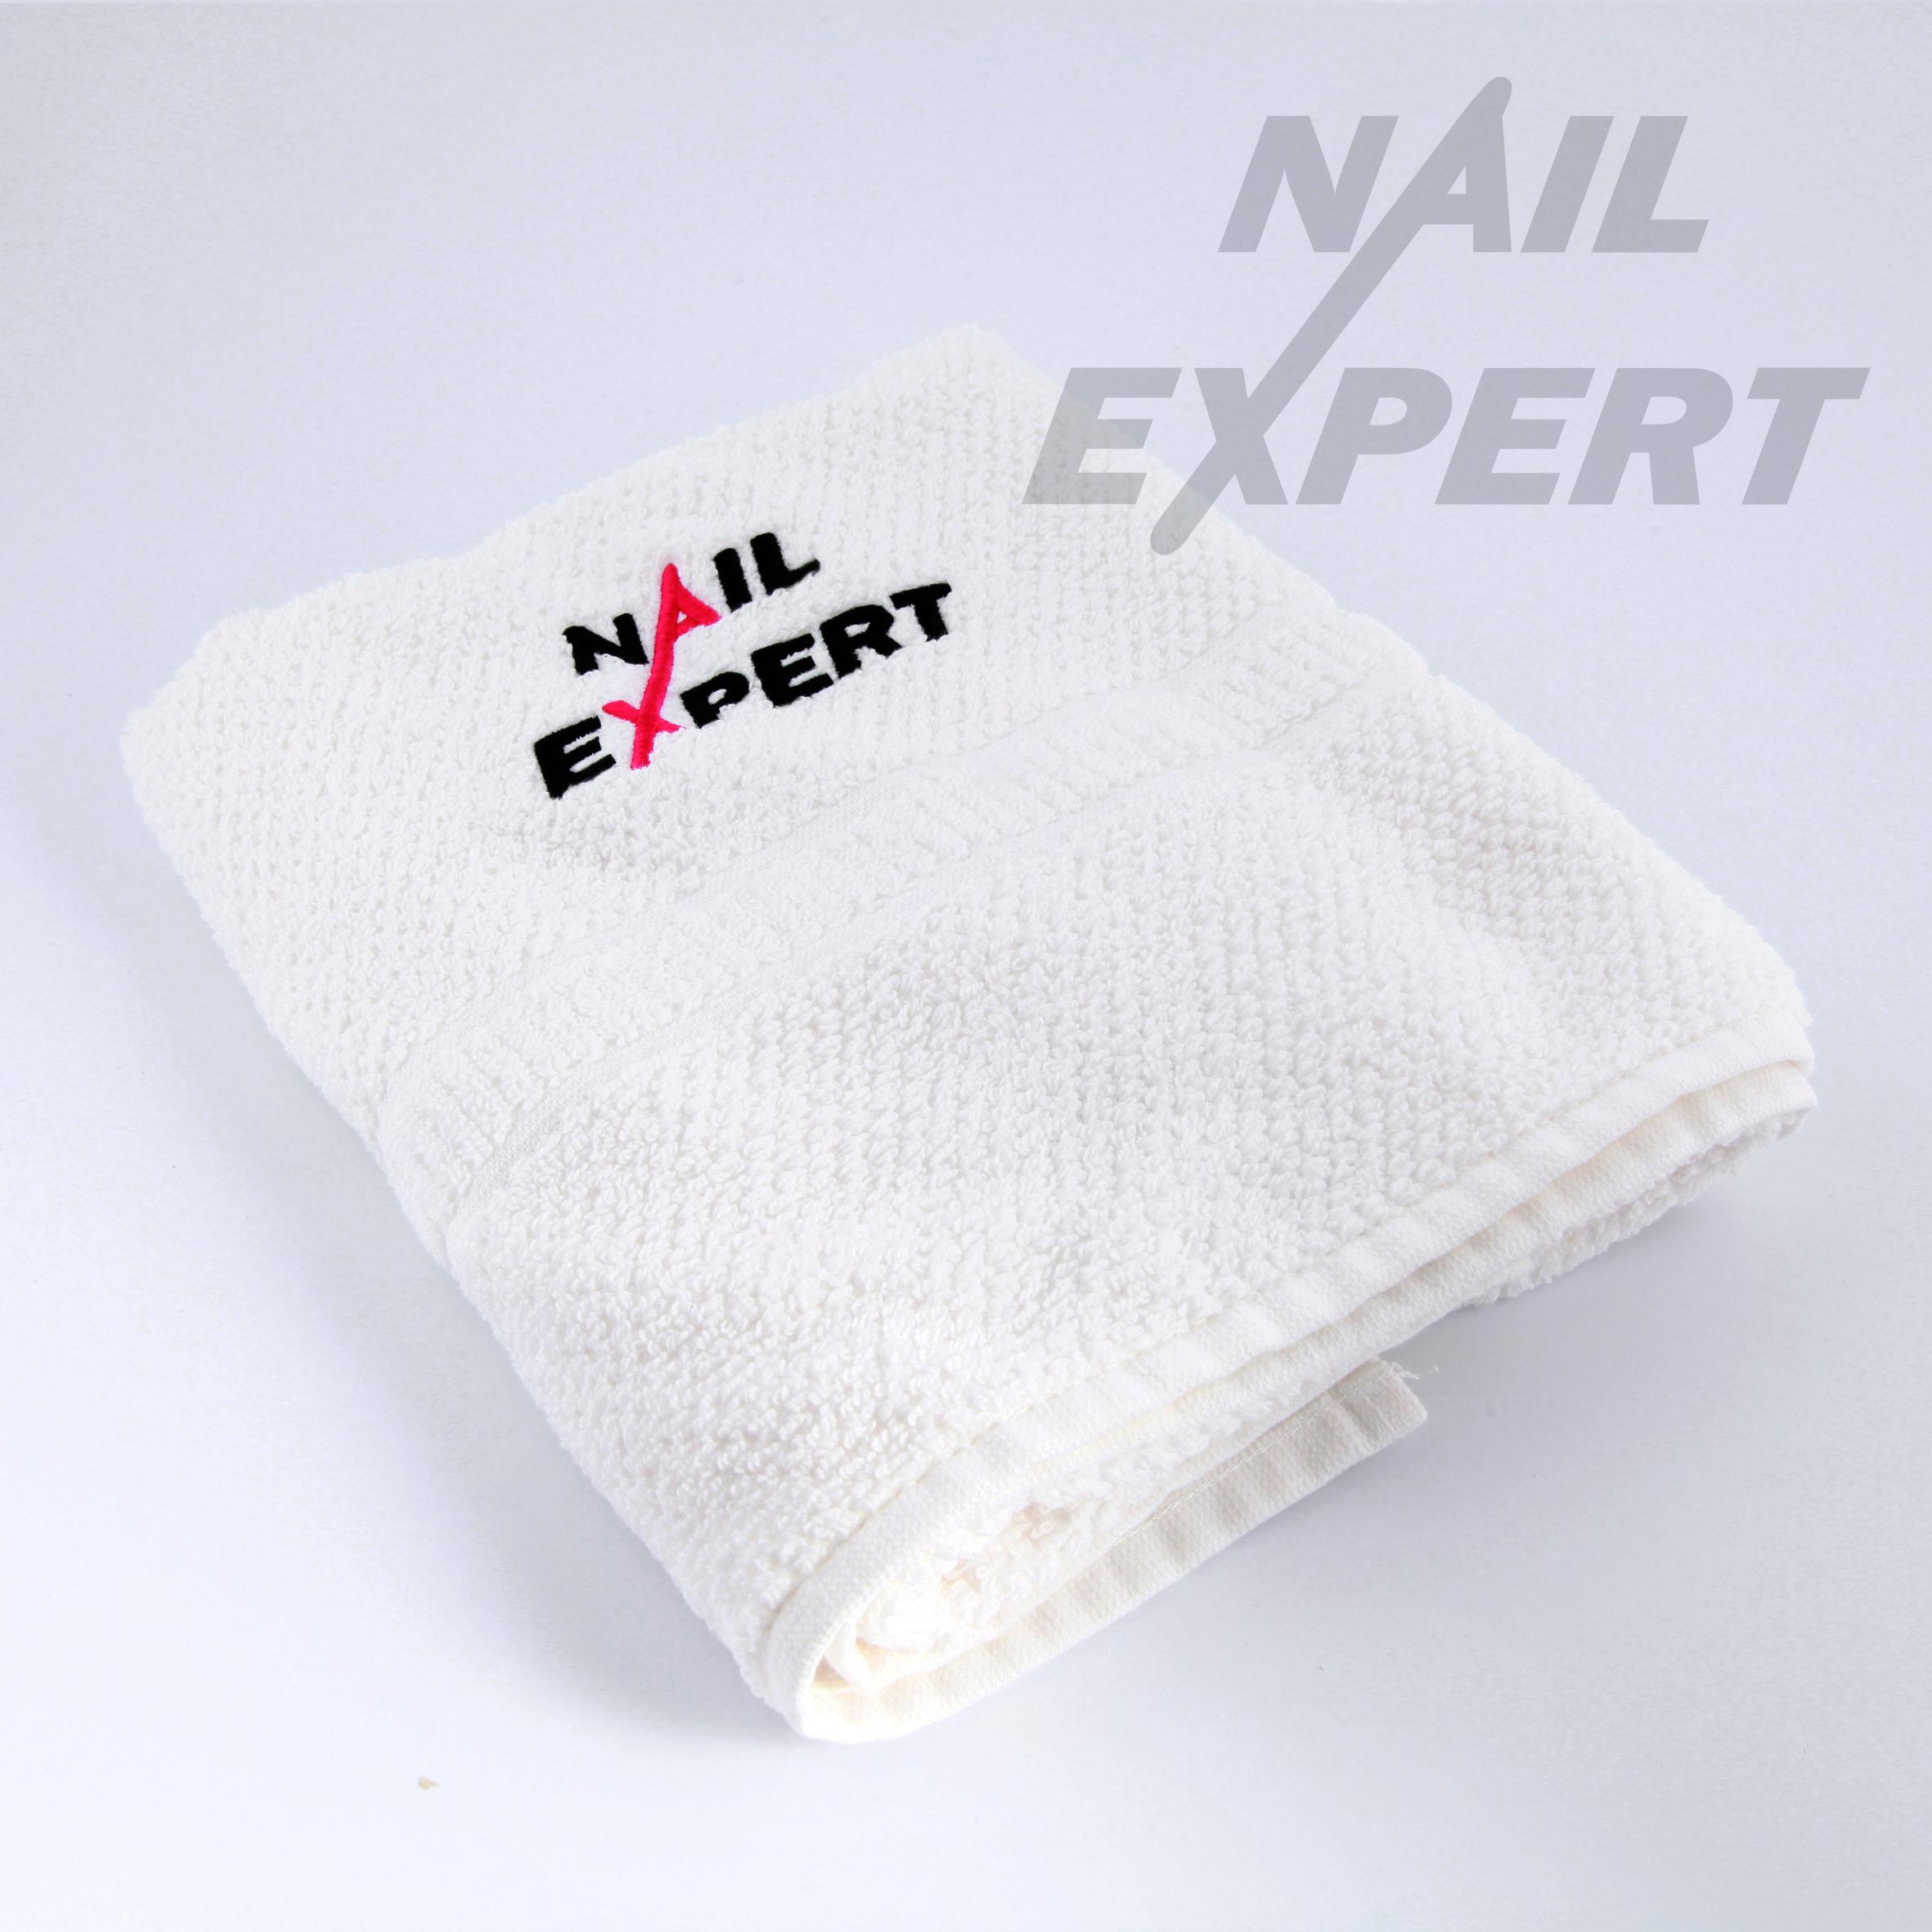 Nail Expert Ručník